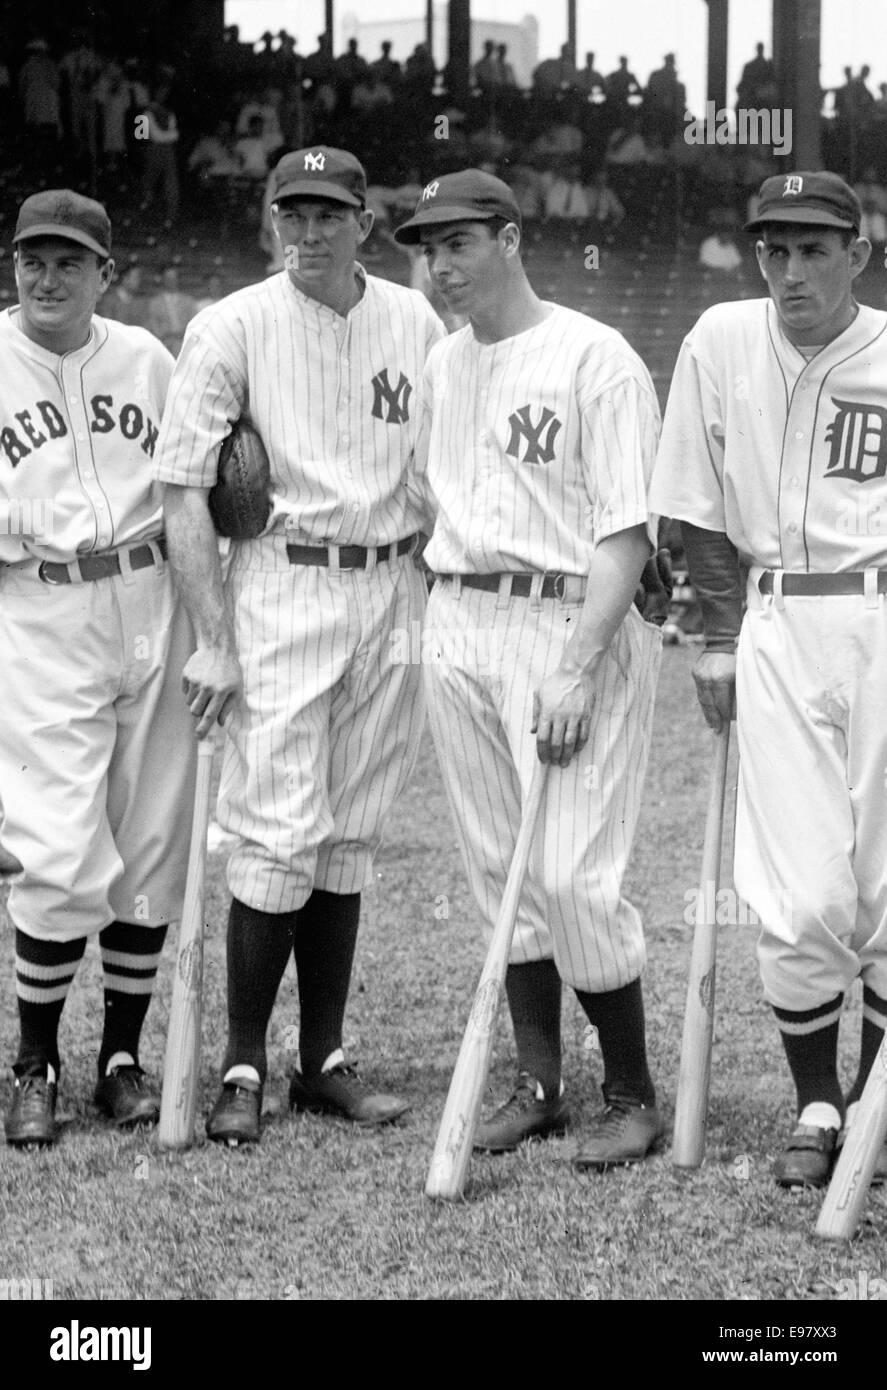 American Baseball players, from left, Joe Cronin, Bill Dickey, Joe DiMaggio and Charley Gehringer - Stock Image